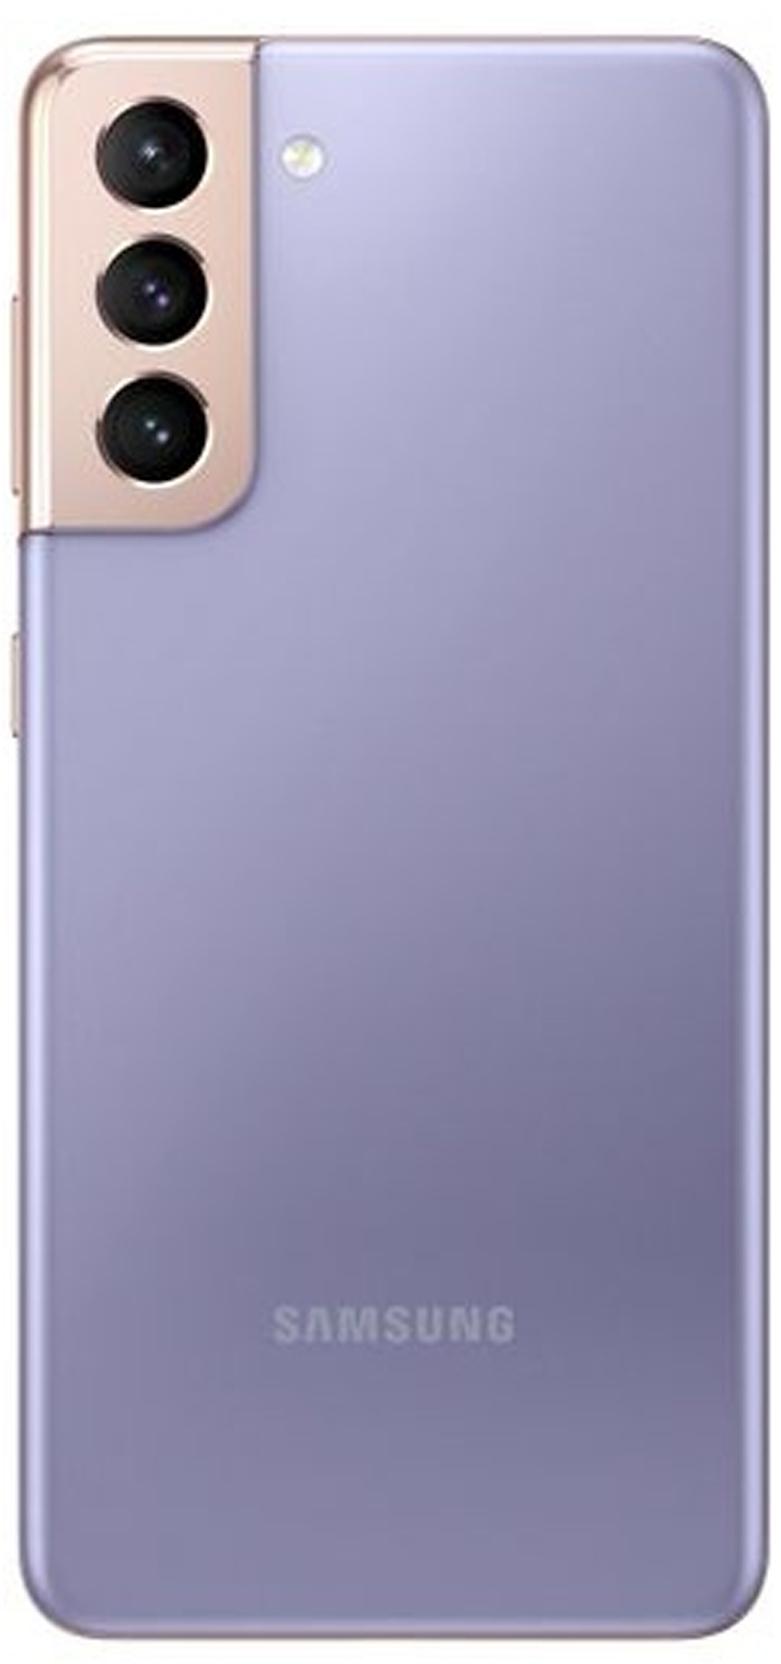 Samsung Galaxy S21 Plus 5G Phantom Violet 8GB RAM |128GB